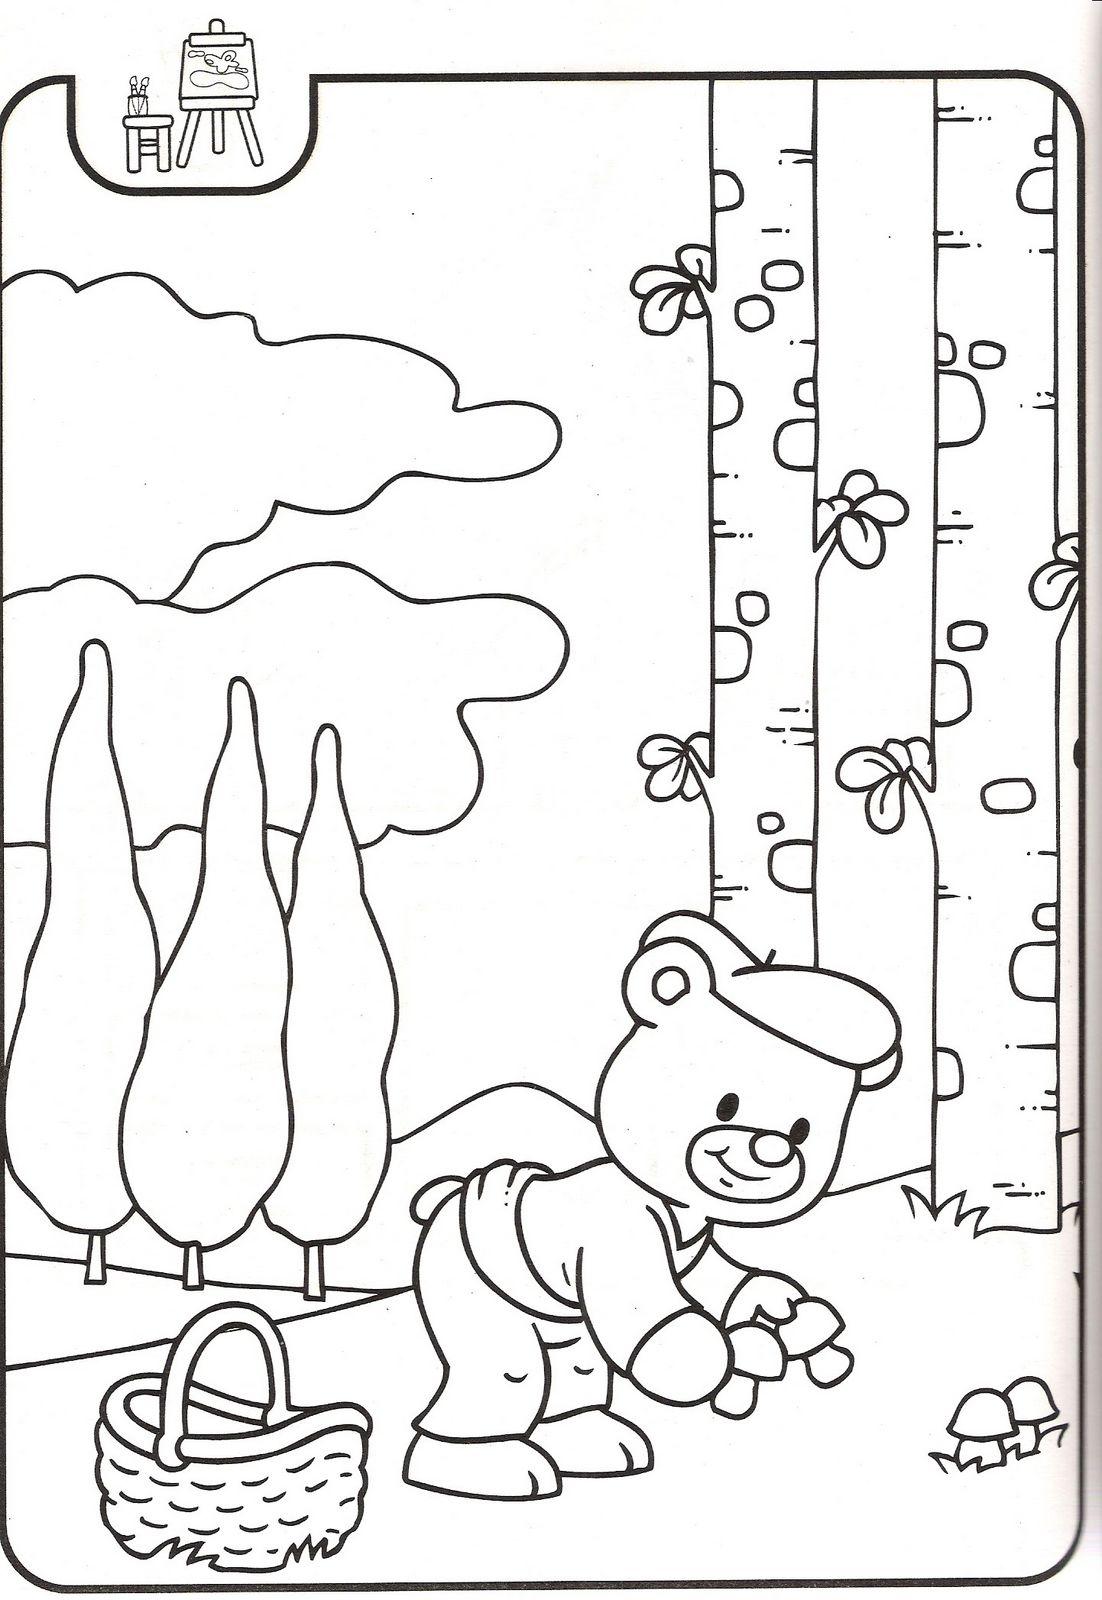 Dibujos infantiles caperucita roja - Dibujos para colorear - IMAGIXS